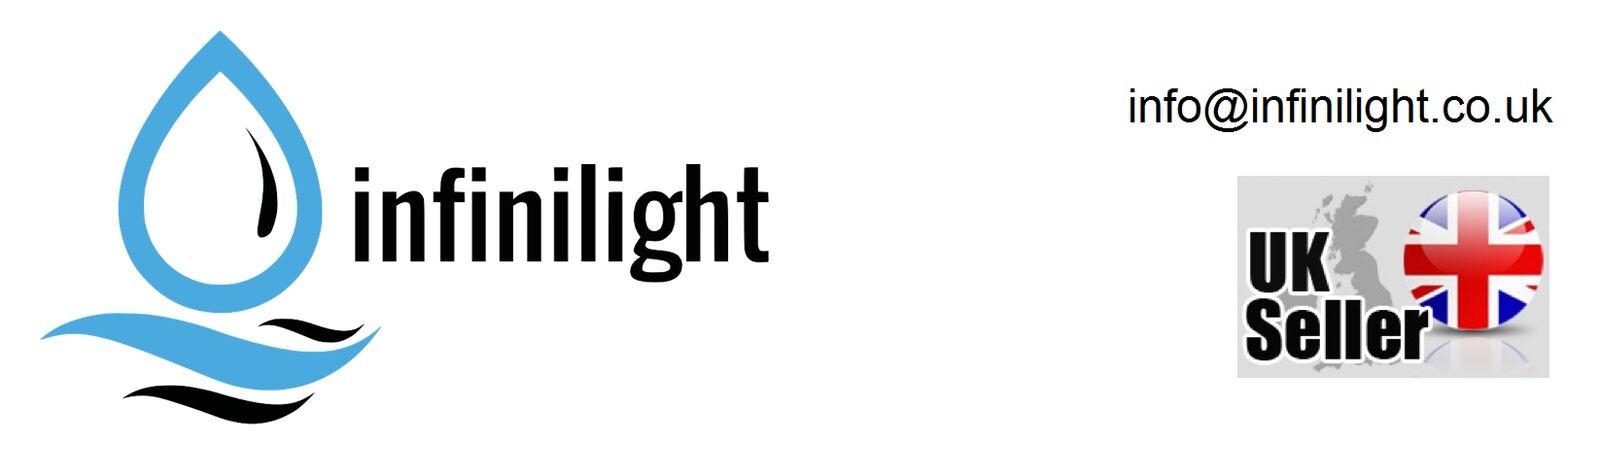 infinilight